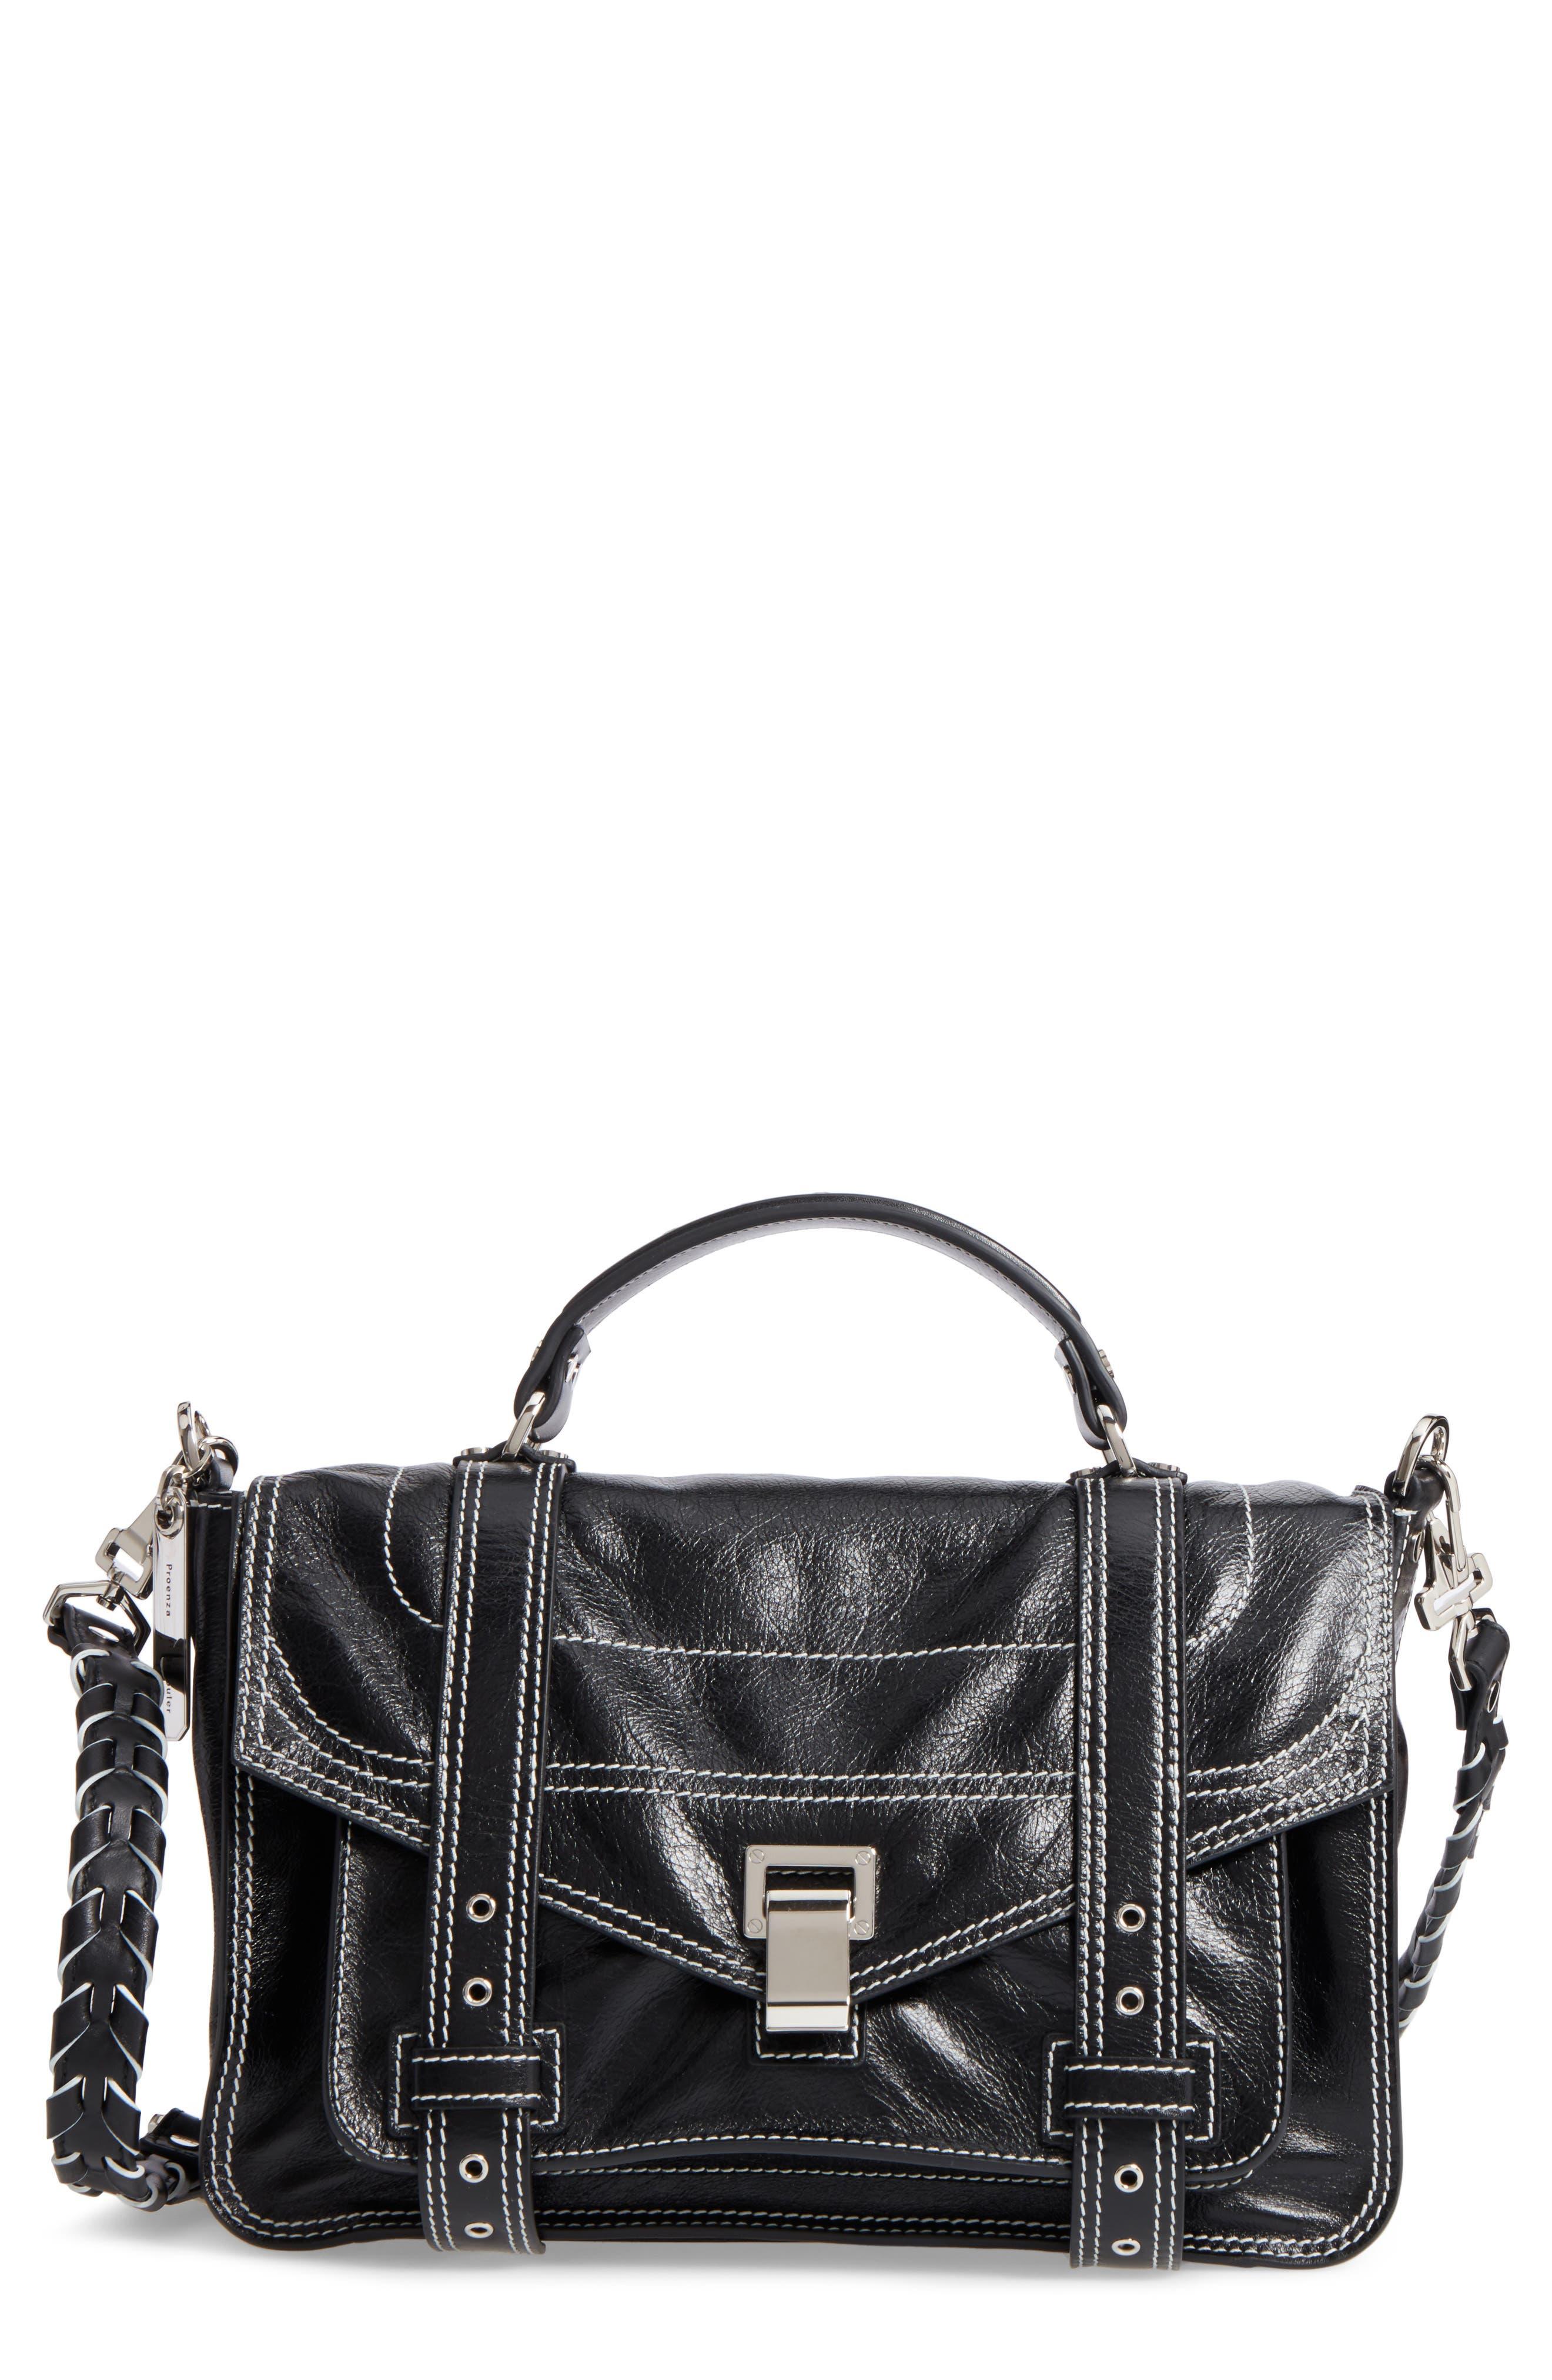 Alternate Image 1 Selected - Proenza Schouler Medium PS1 Calfskin Leather Satchel